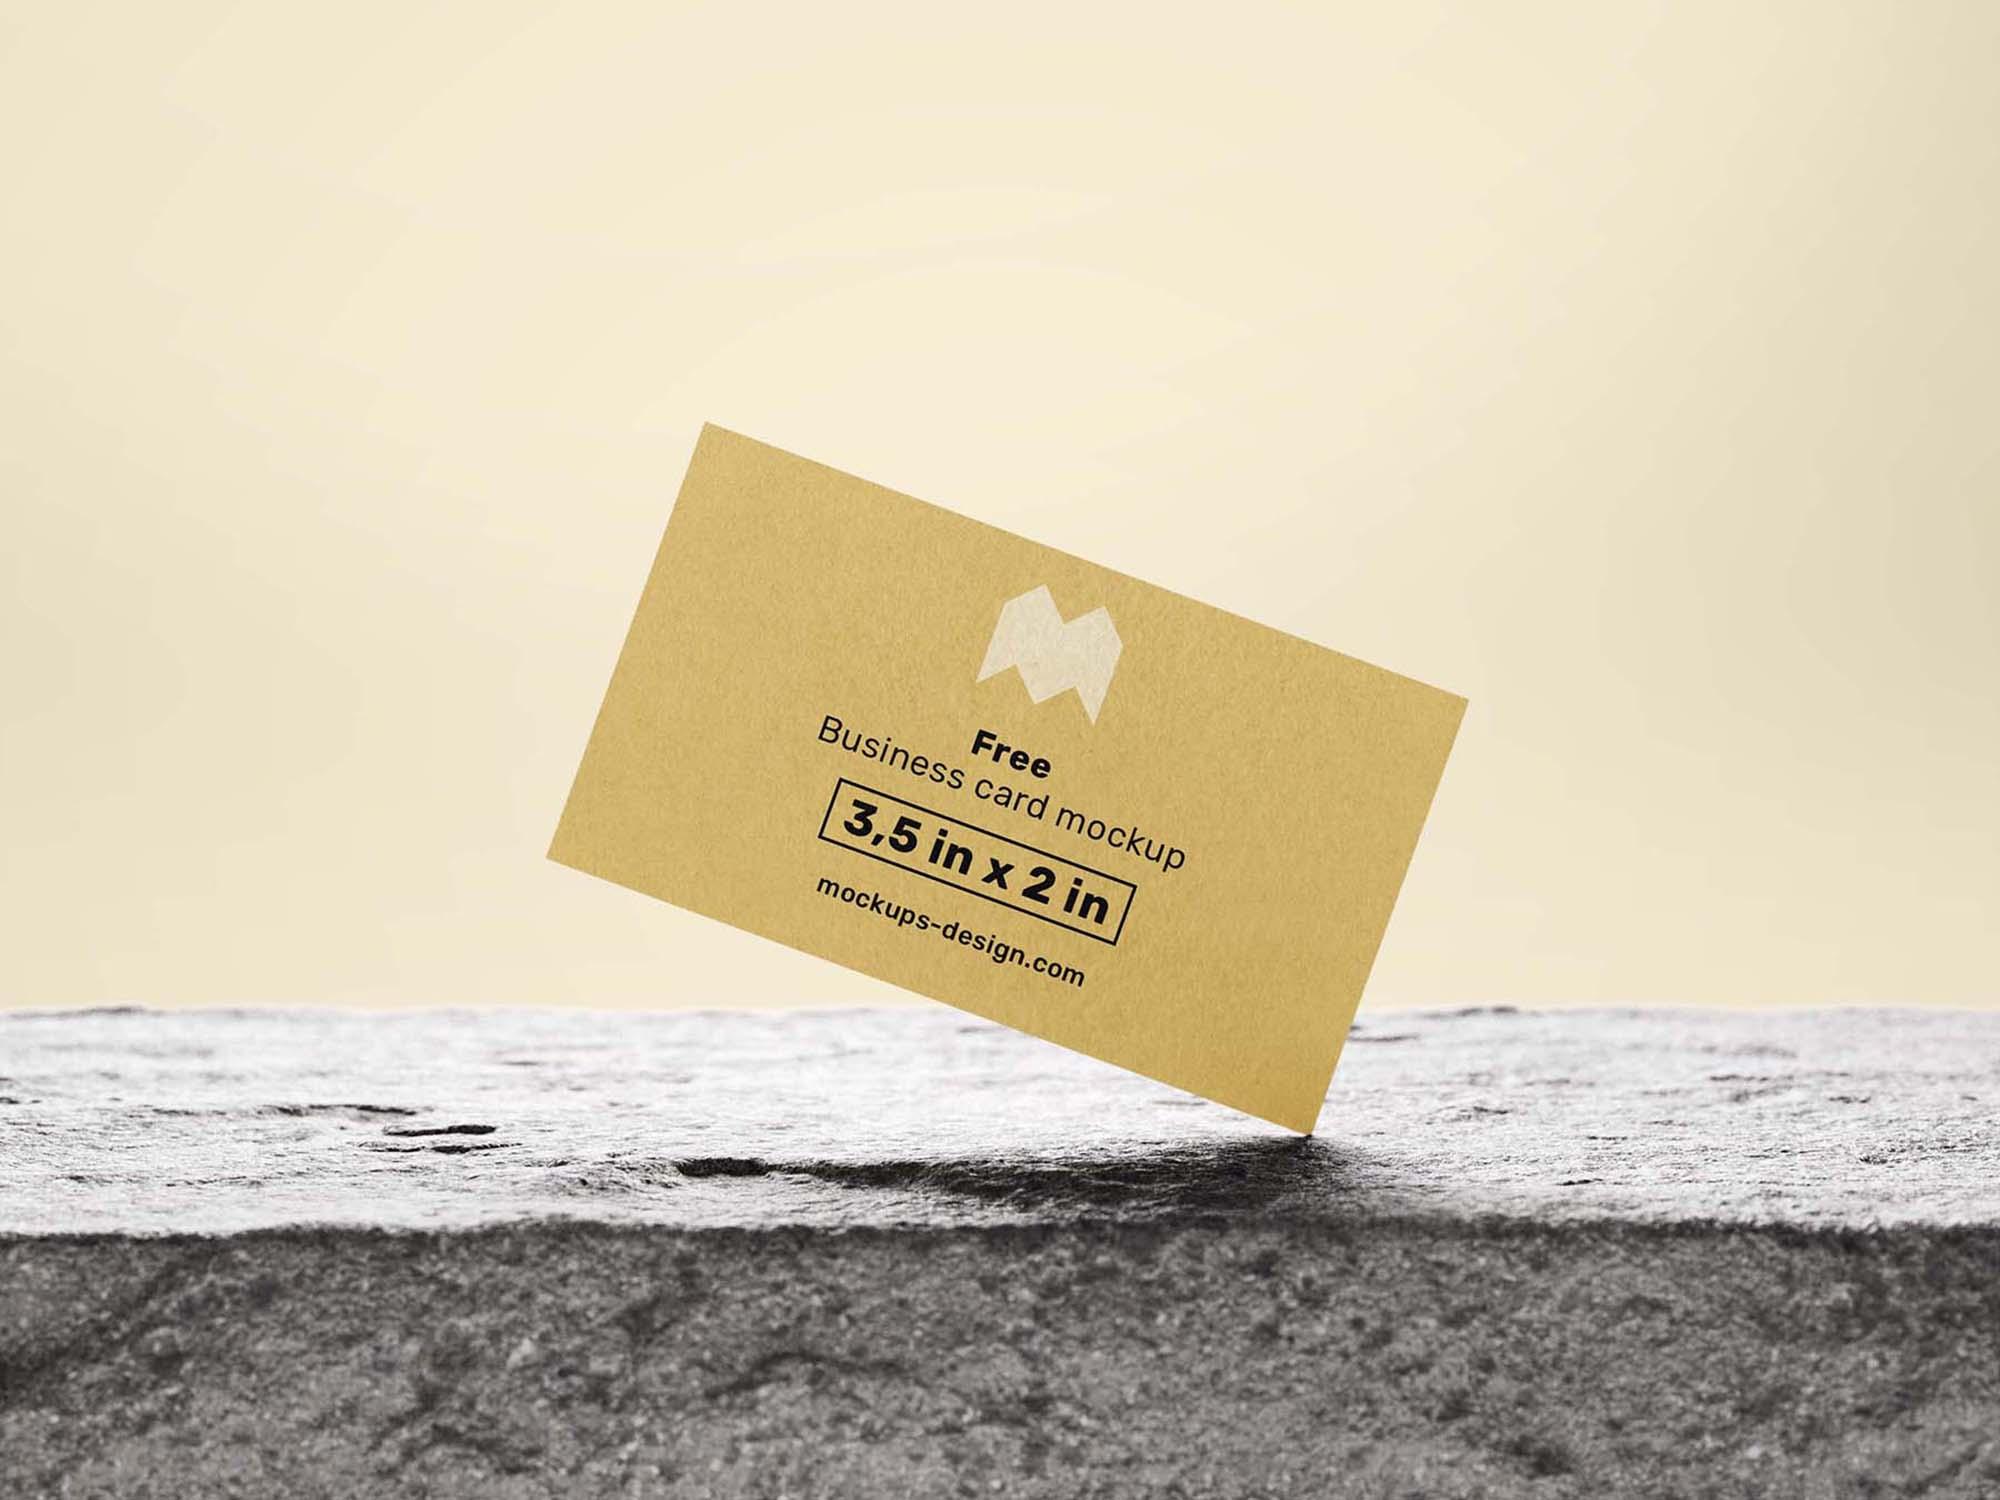 Business Card on Natural Rock Mockup 2